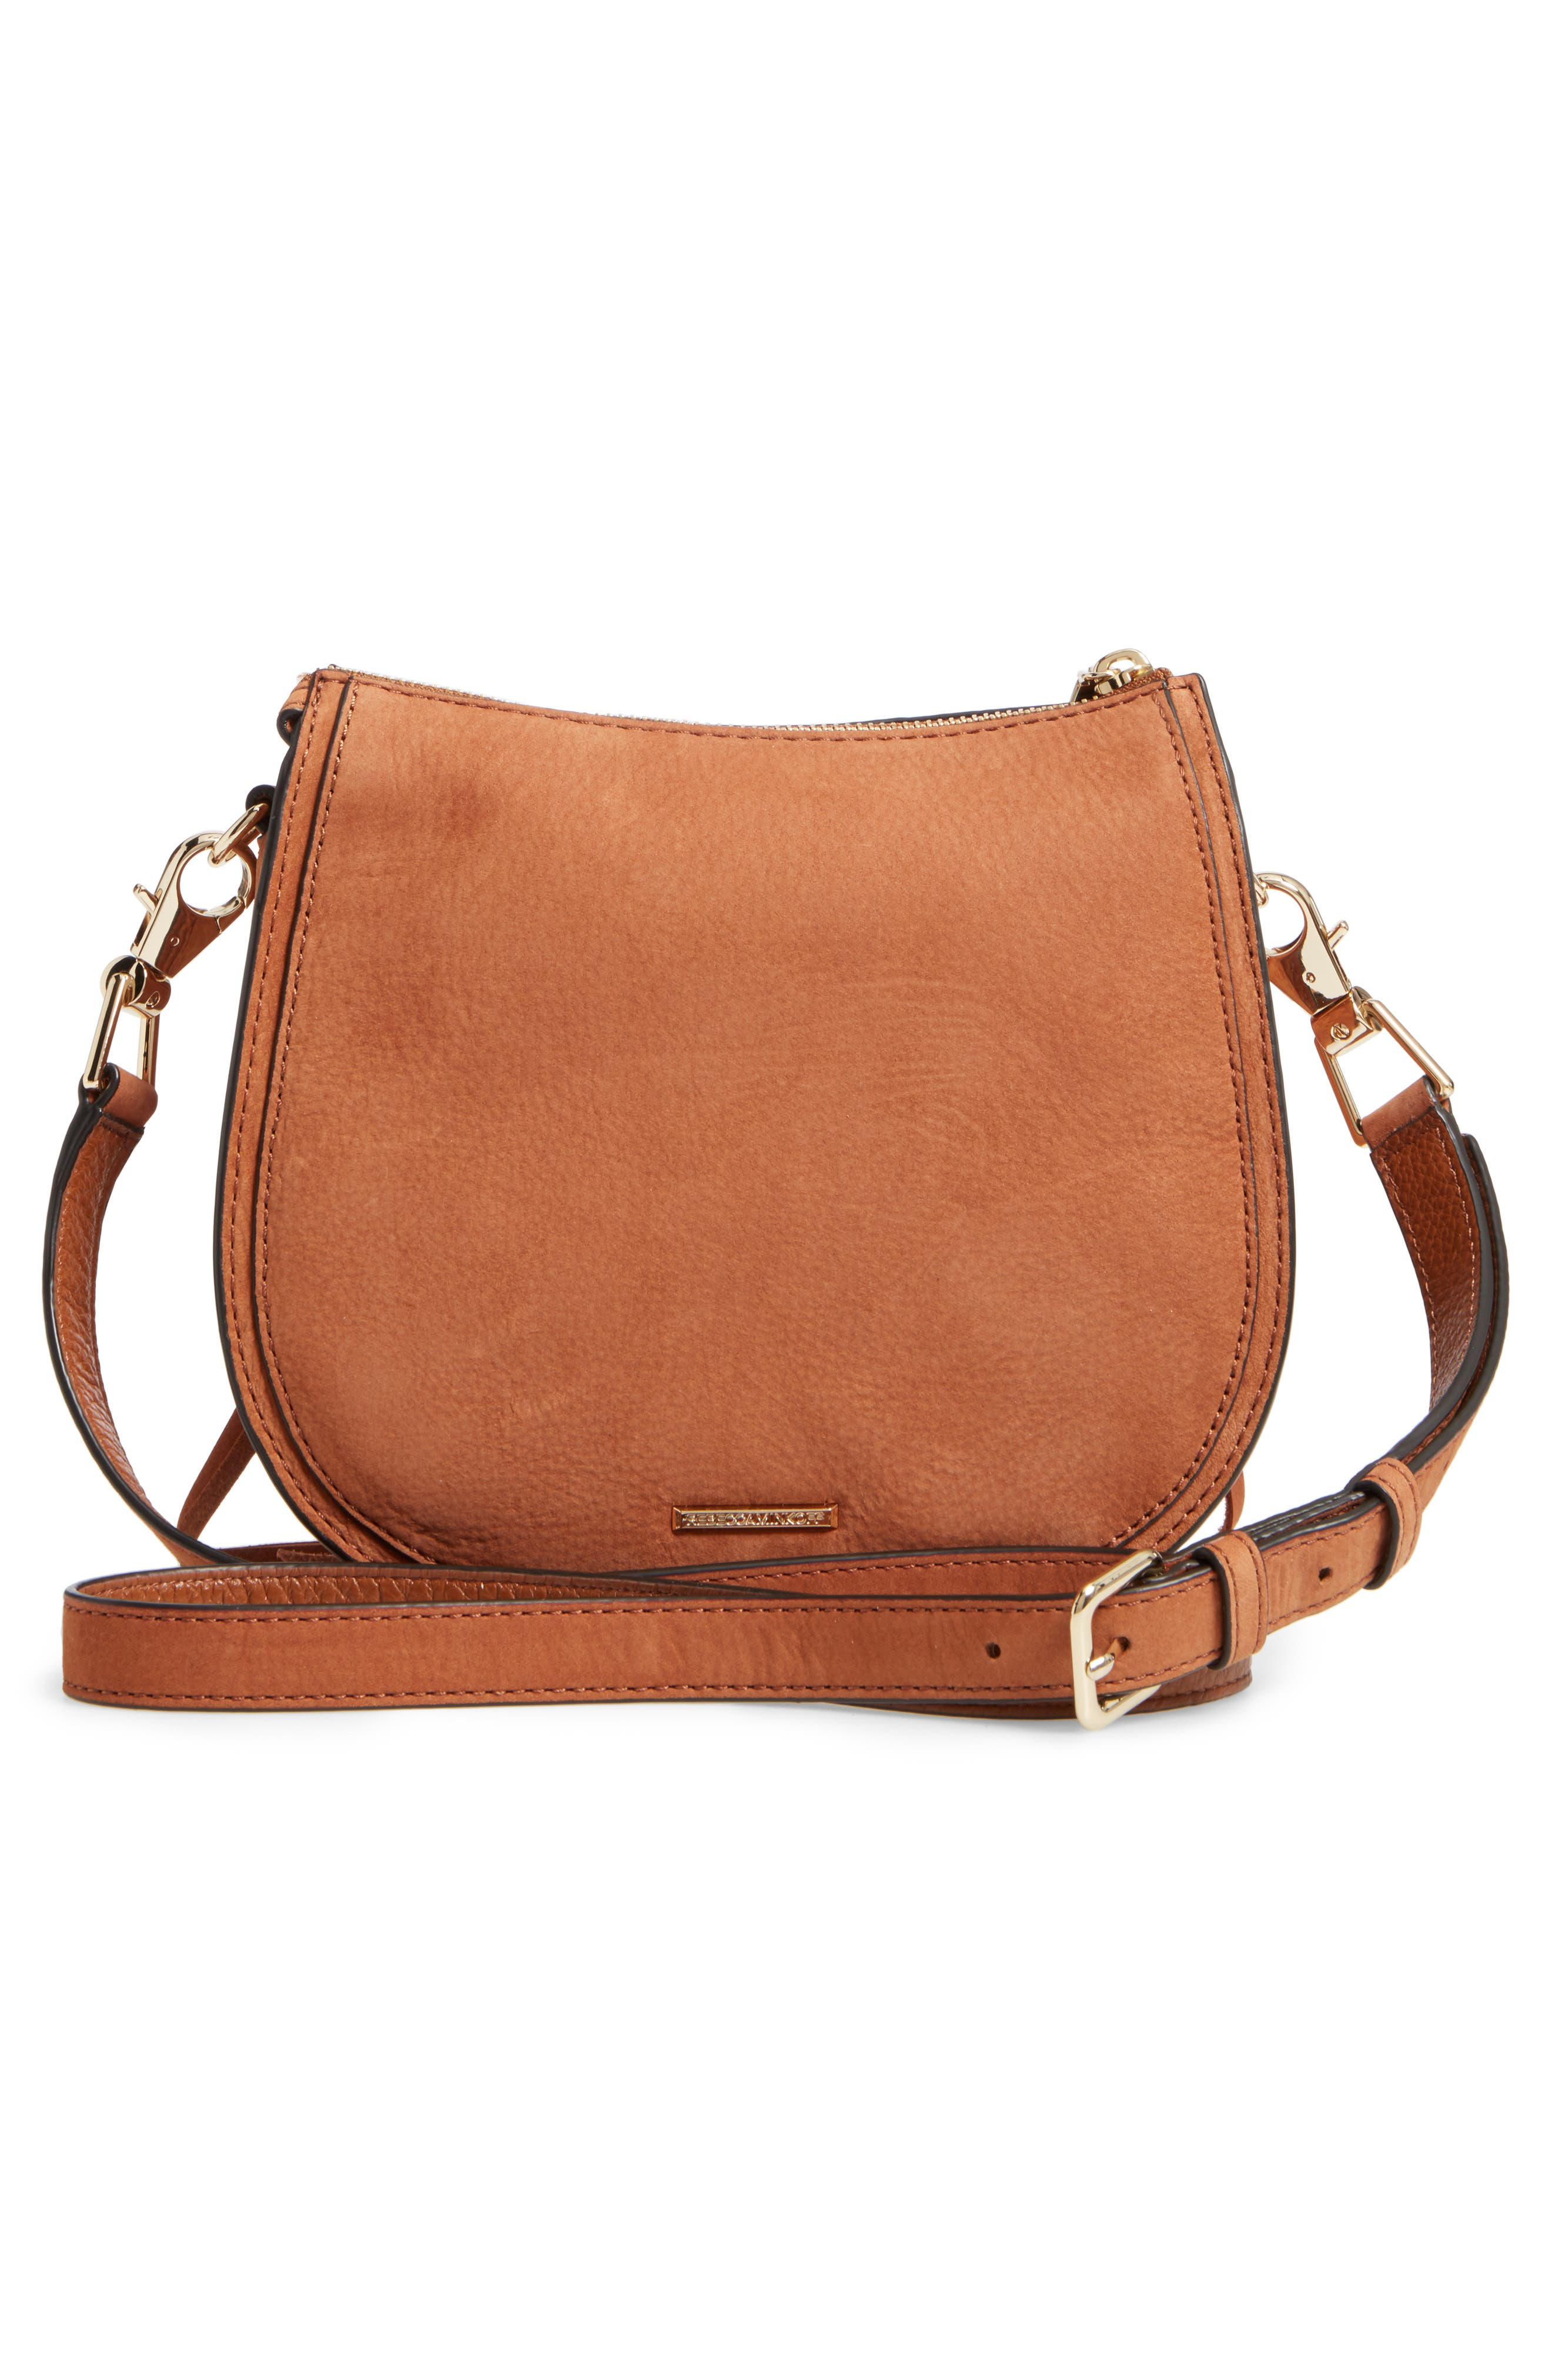 Mini Vanity Saddle Bag,                             Alternate thumbnail 3, color,                             Almond Nubuck